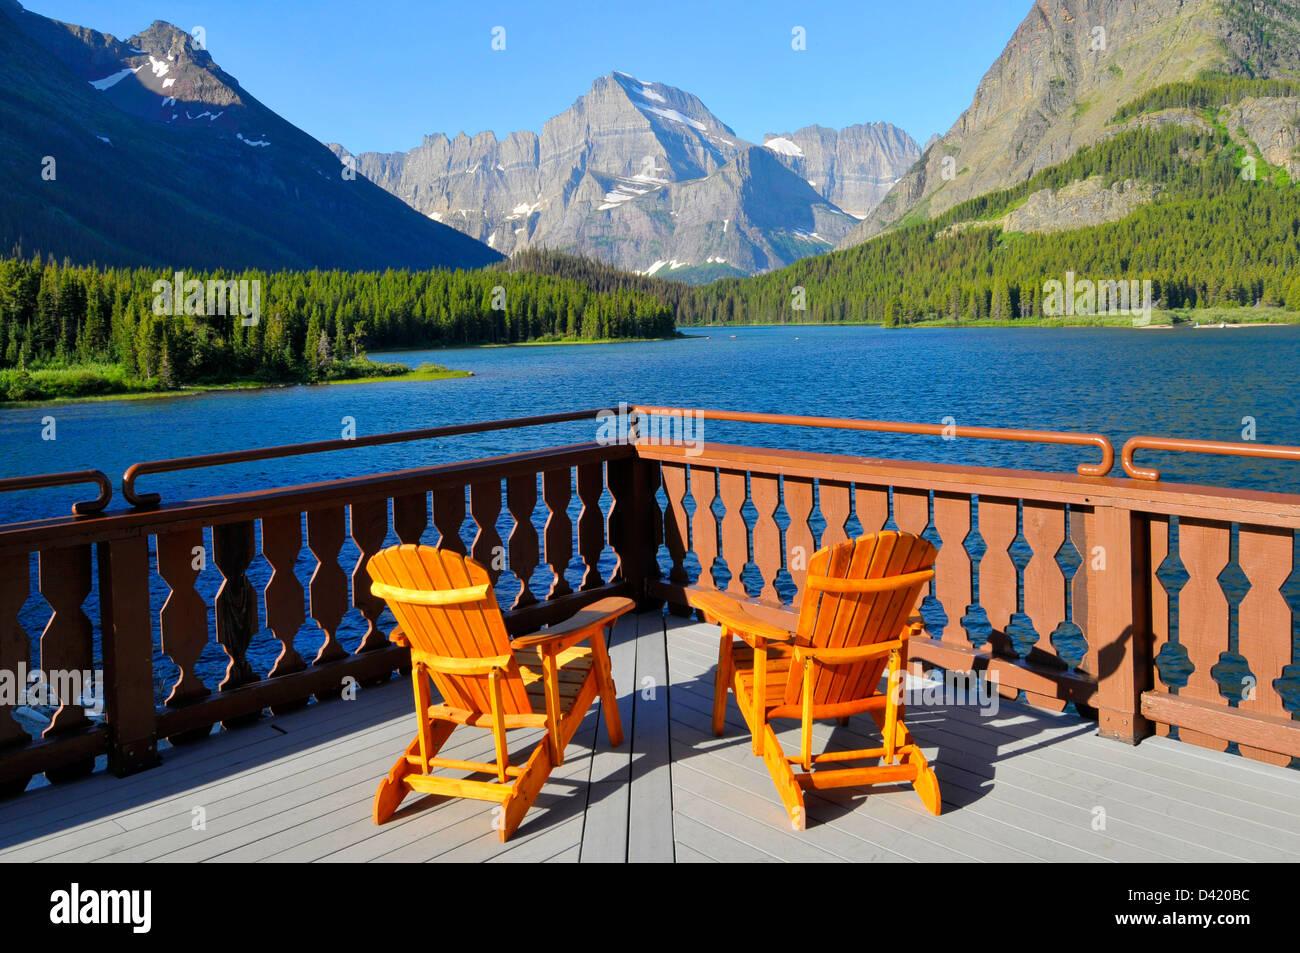 Many Glacier Hotel Glacier National Park Montana MT US Stock Photo